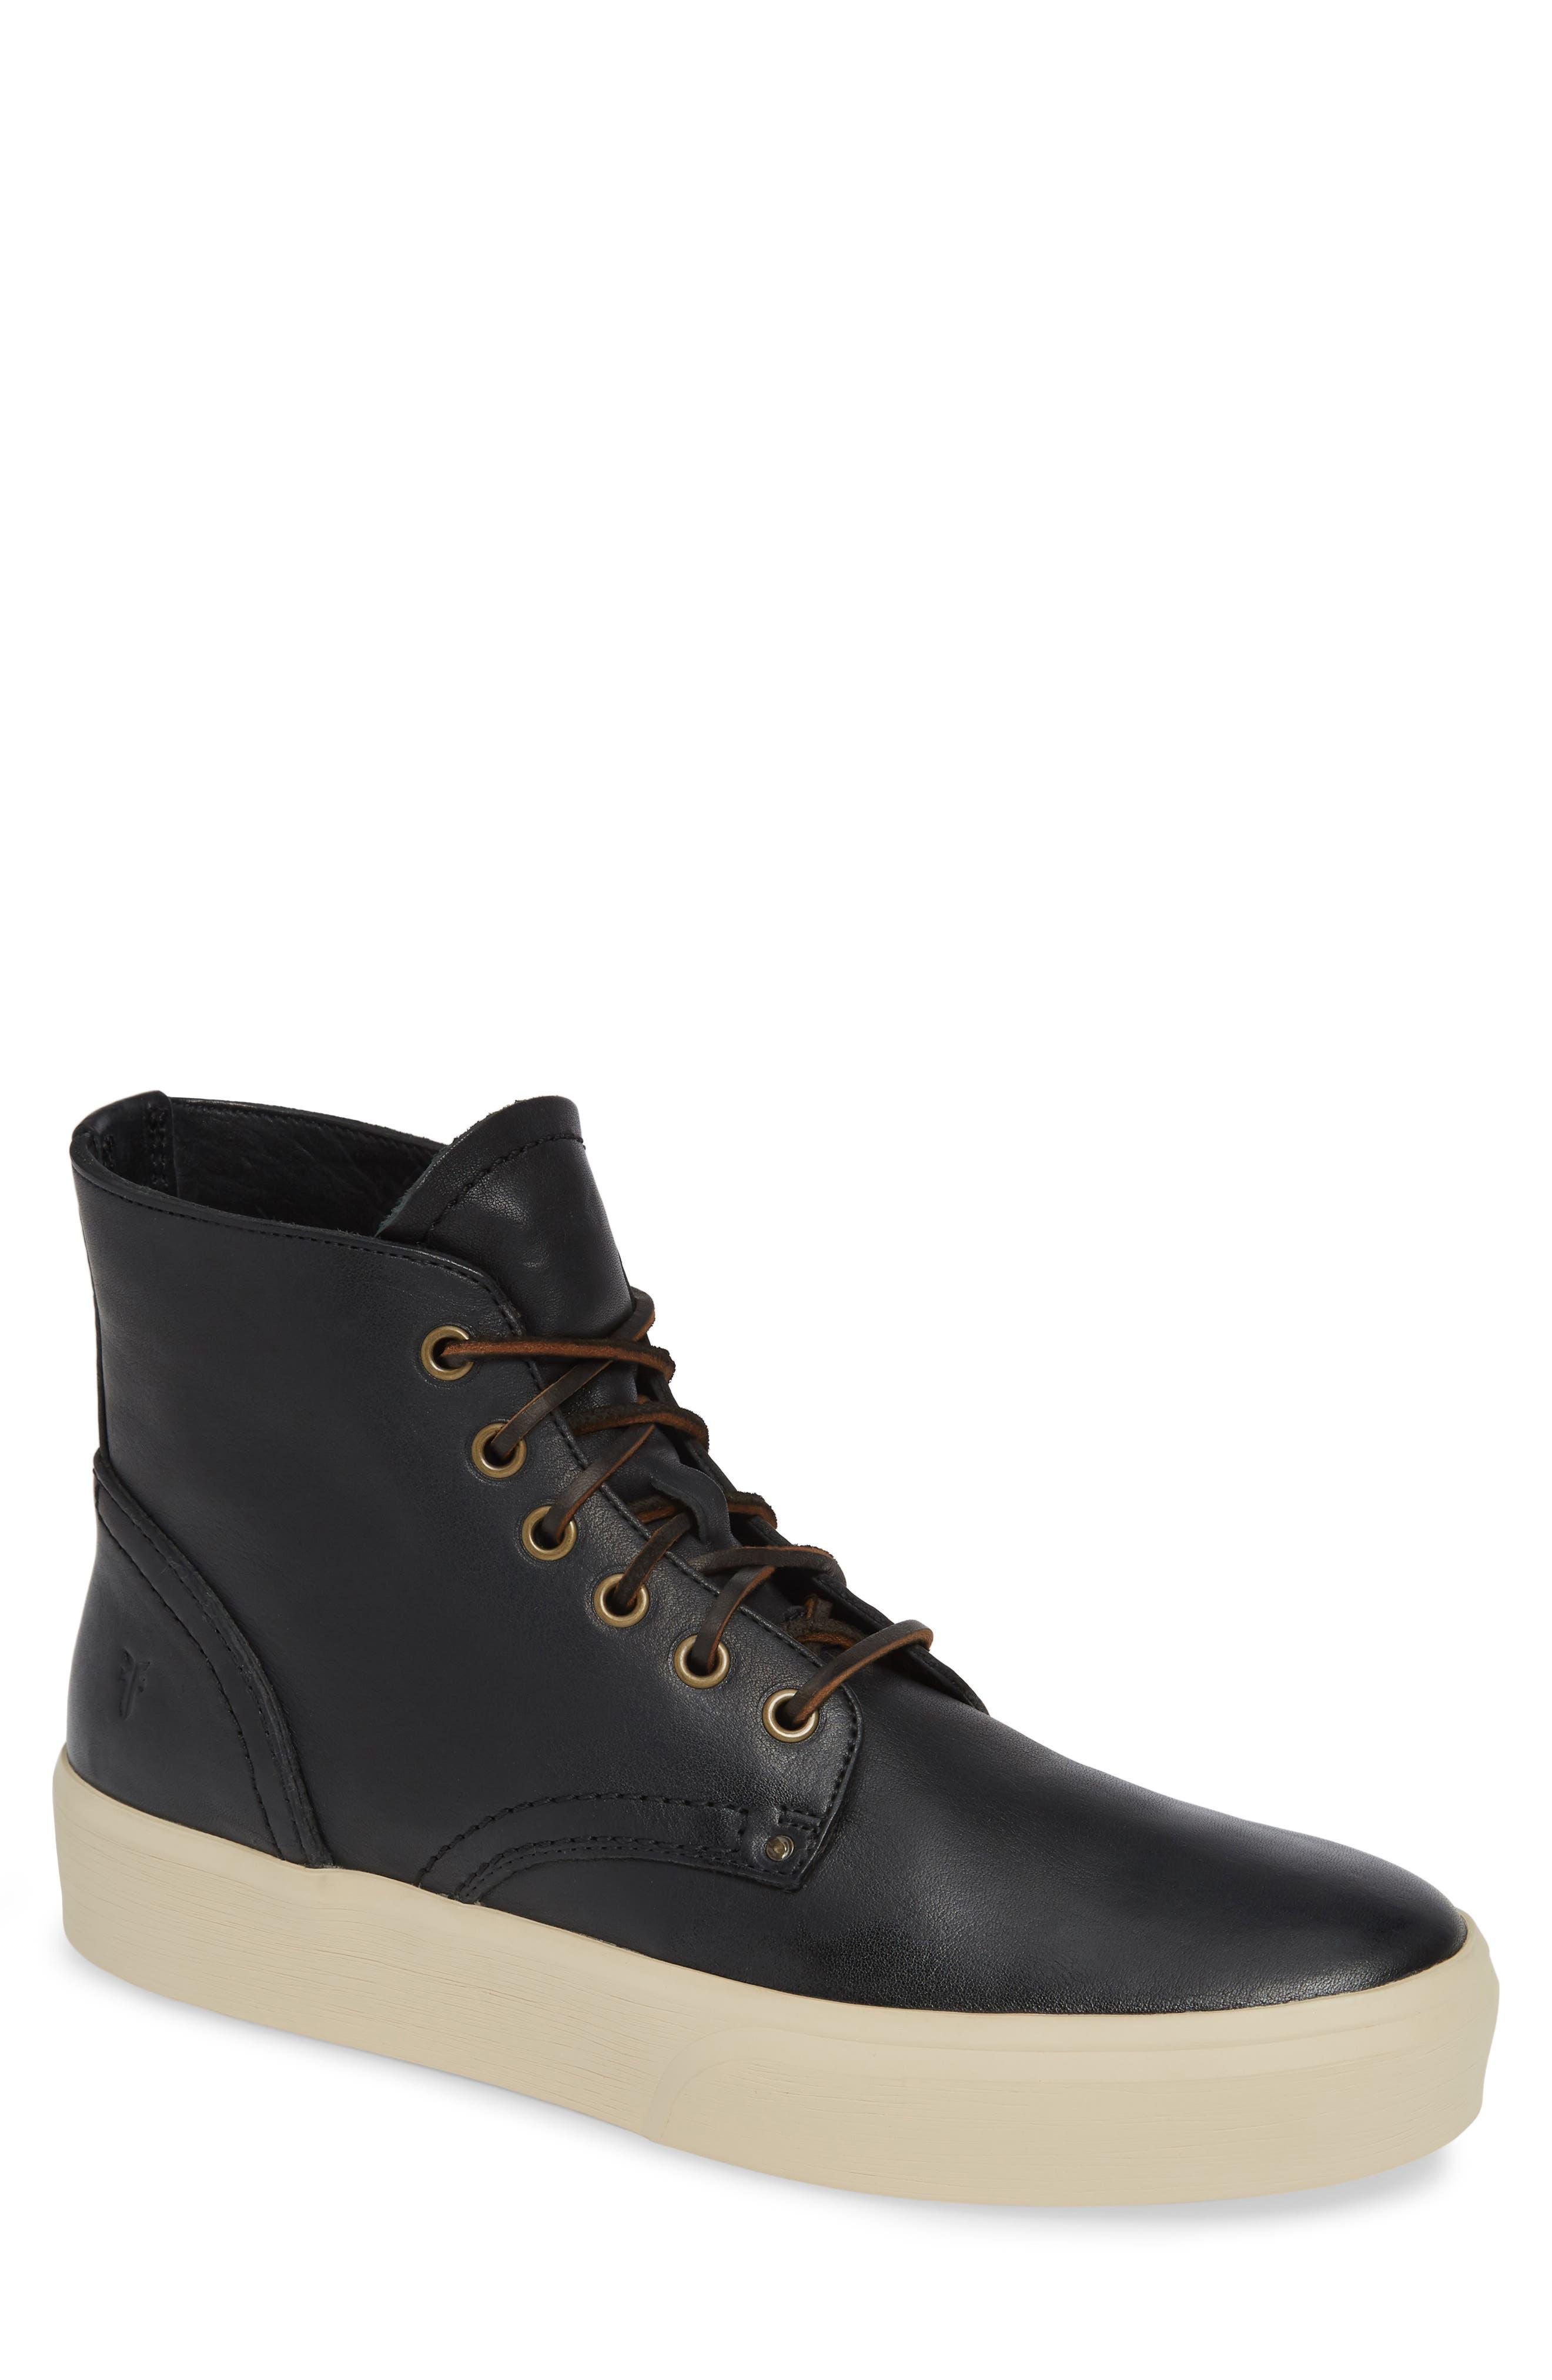 Beacon High Top Platform Sneaker,                             Main thumbnail 1, color,                             BLACK